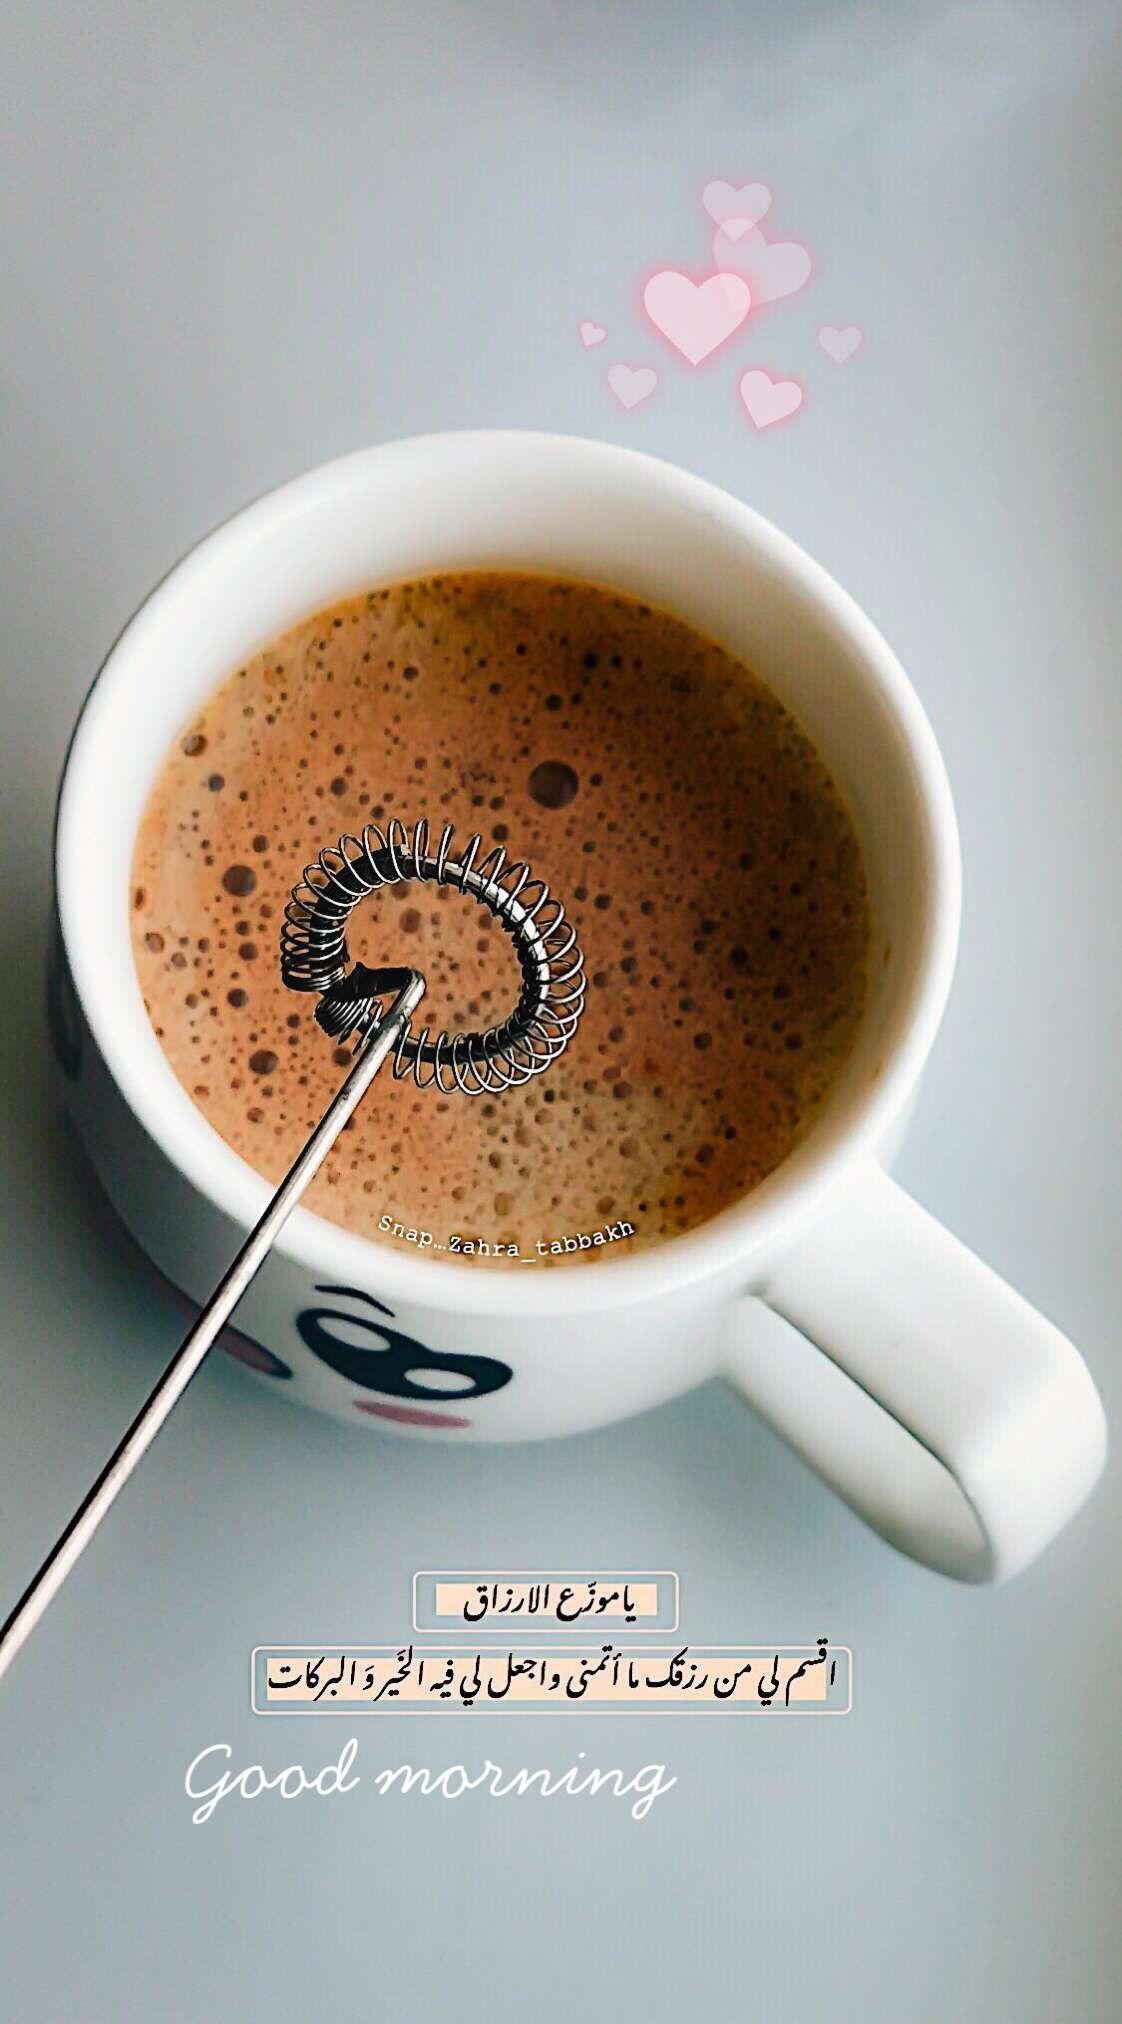 Pin By Zahra Tabbakh On Coffee Free Coffee Coffee Photography Cupcake Logo Design